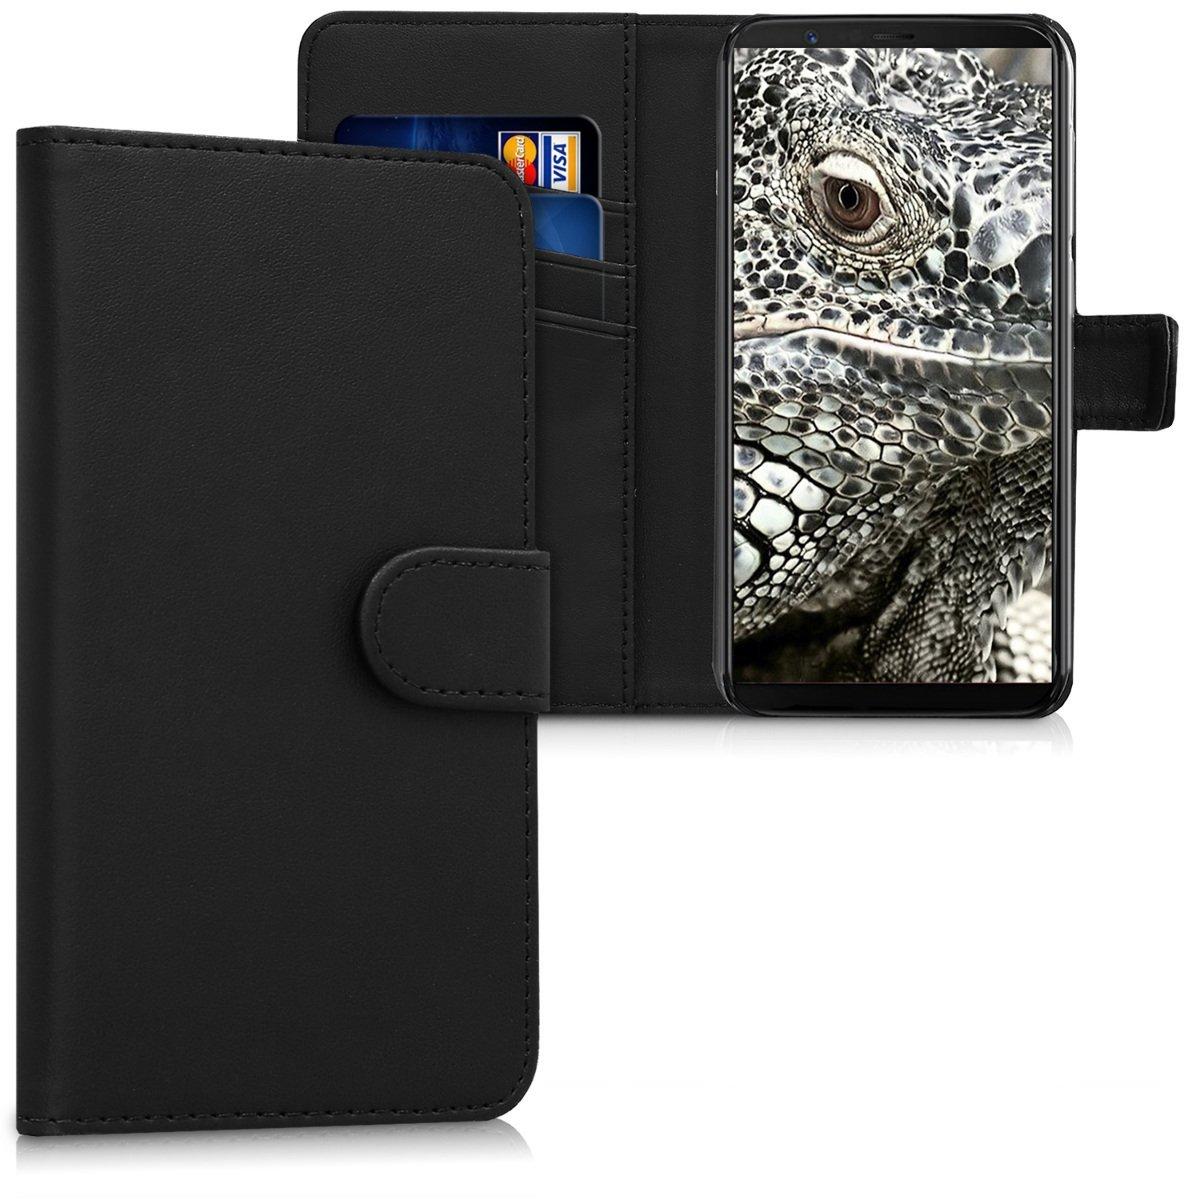 KW Θήκη - Πορτοφόλι OnePlus 5T - Black (43820.01)